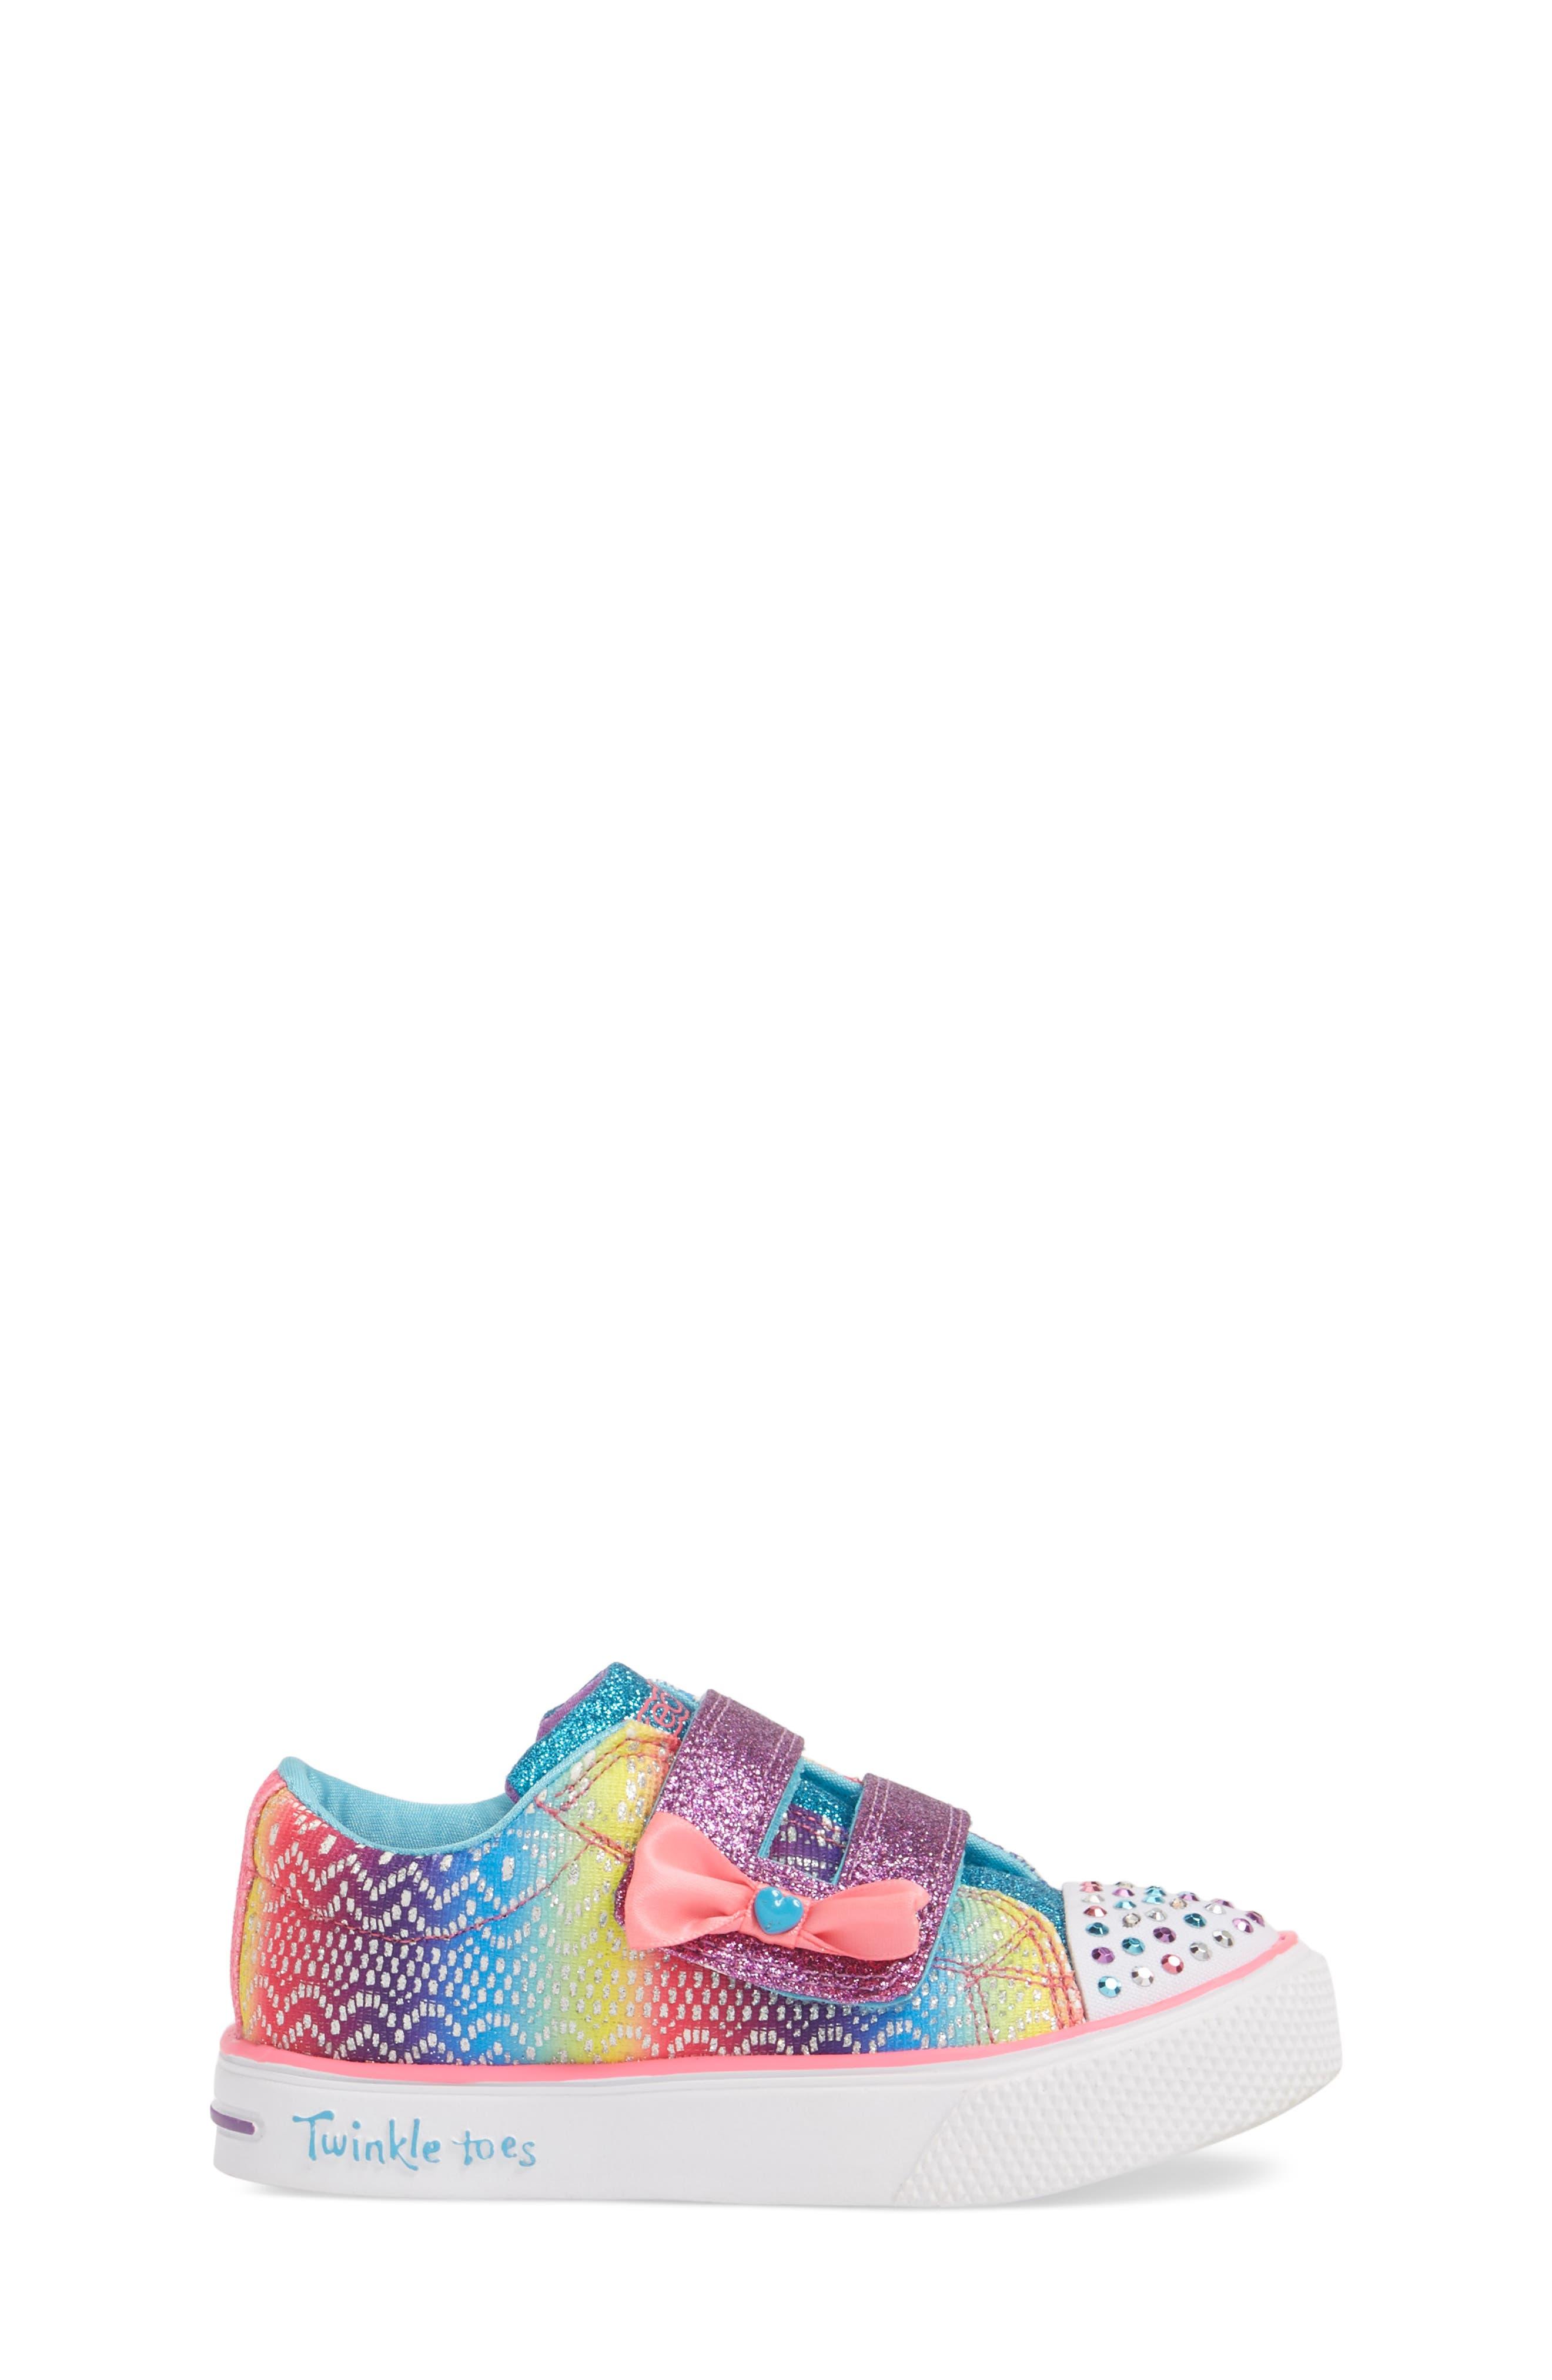 Twinkle Toes Breeze 2.0 Light-Up Sneaker,                             Alternate thumbnail 3, color,                             Multi